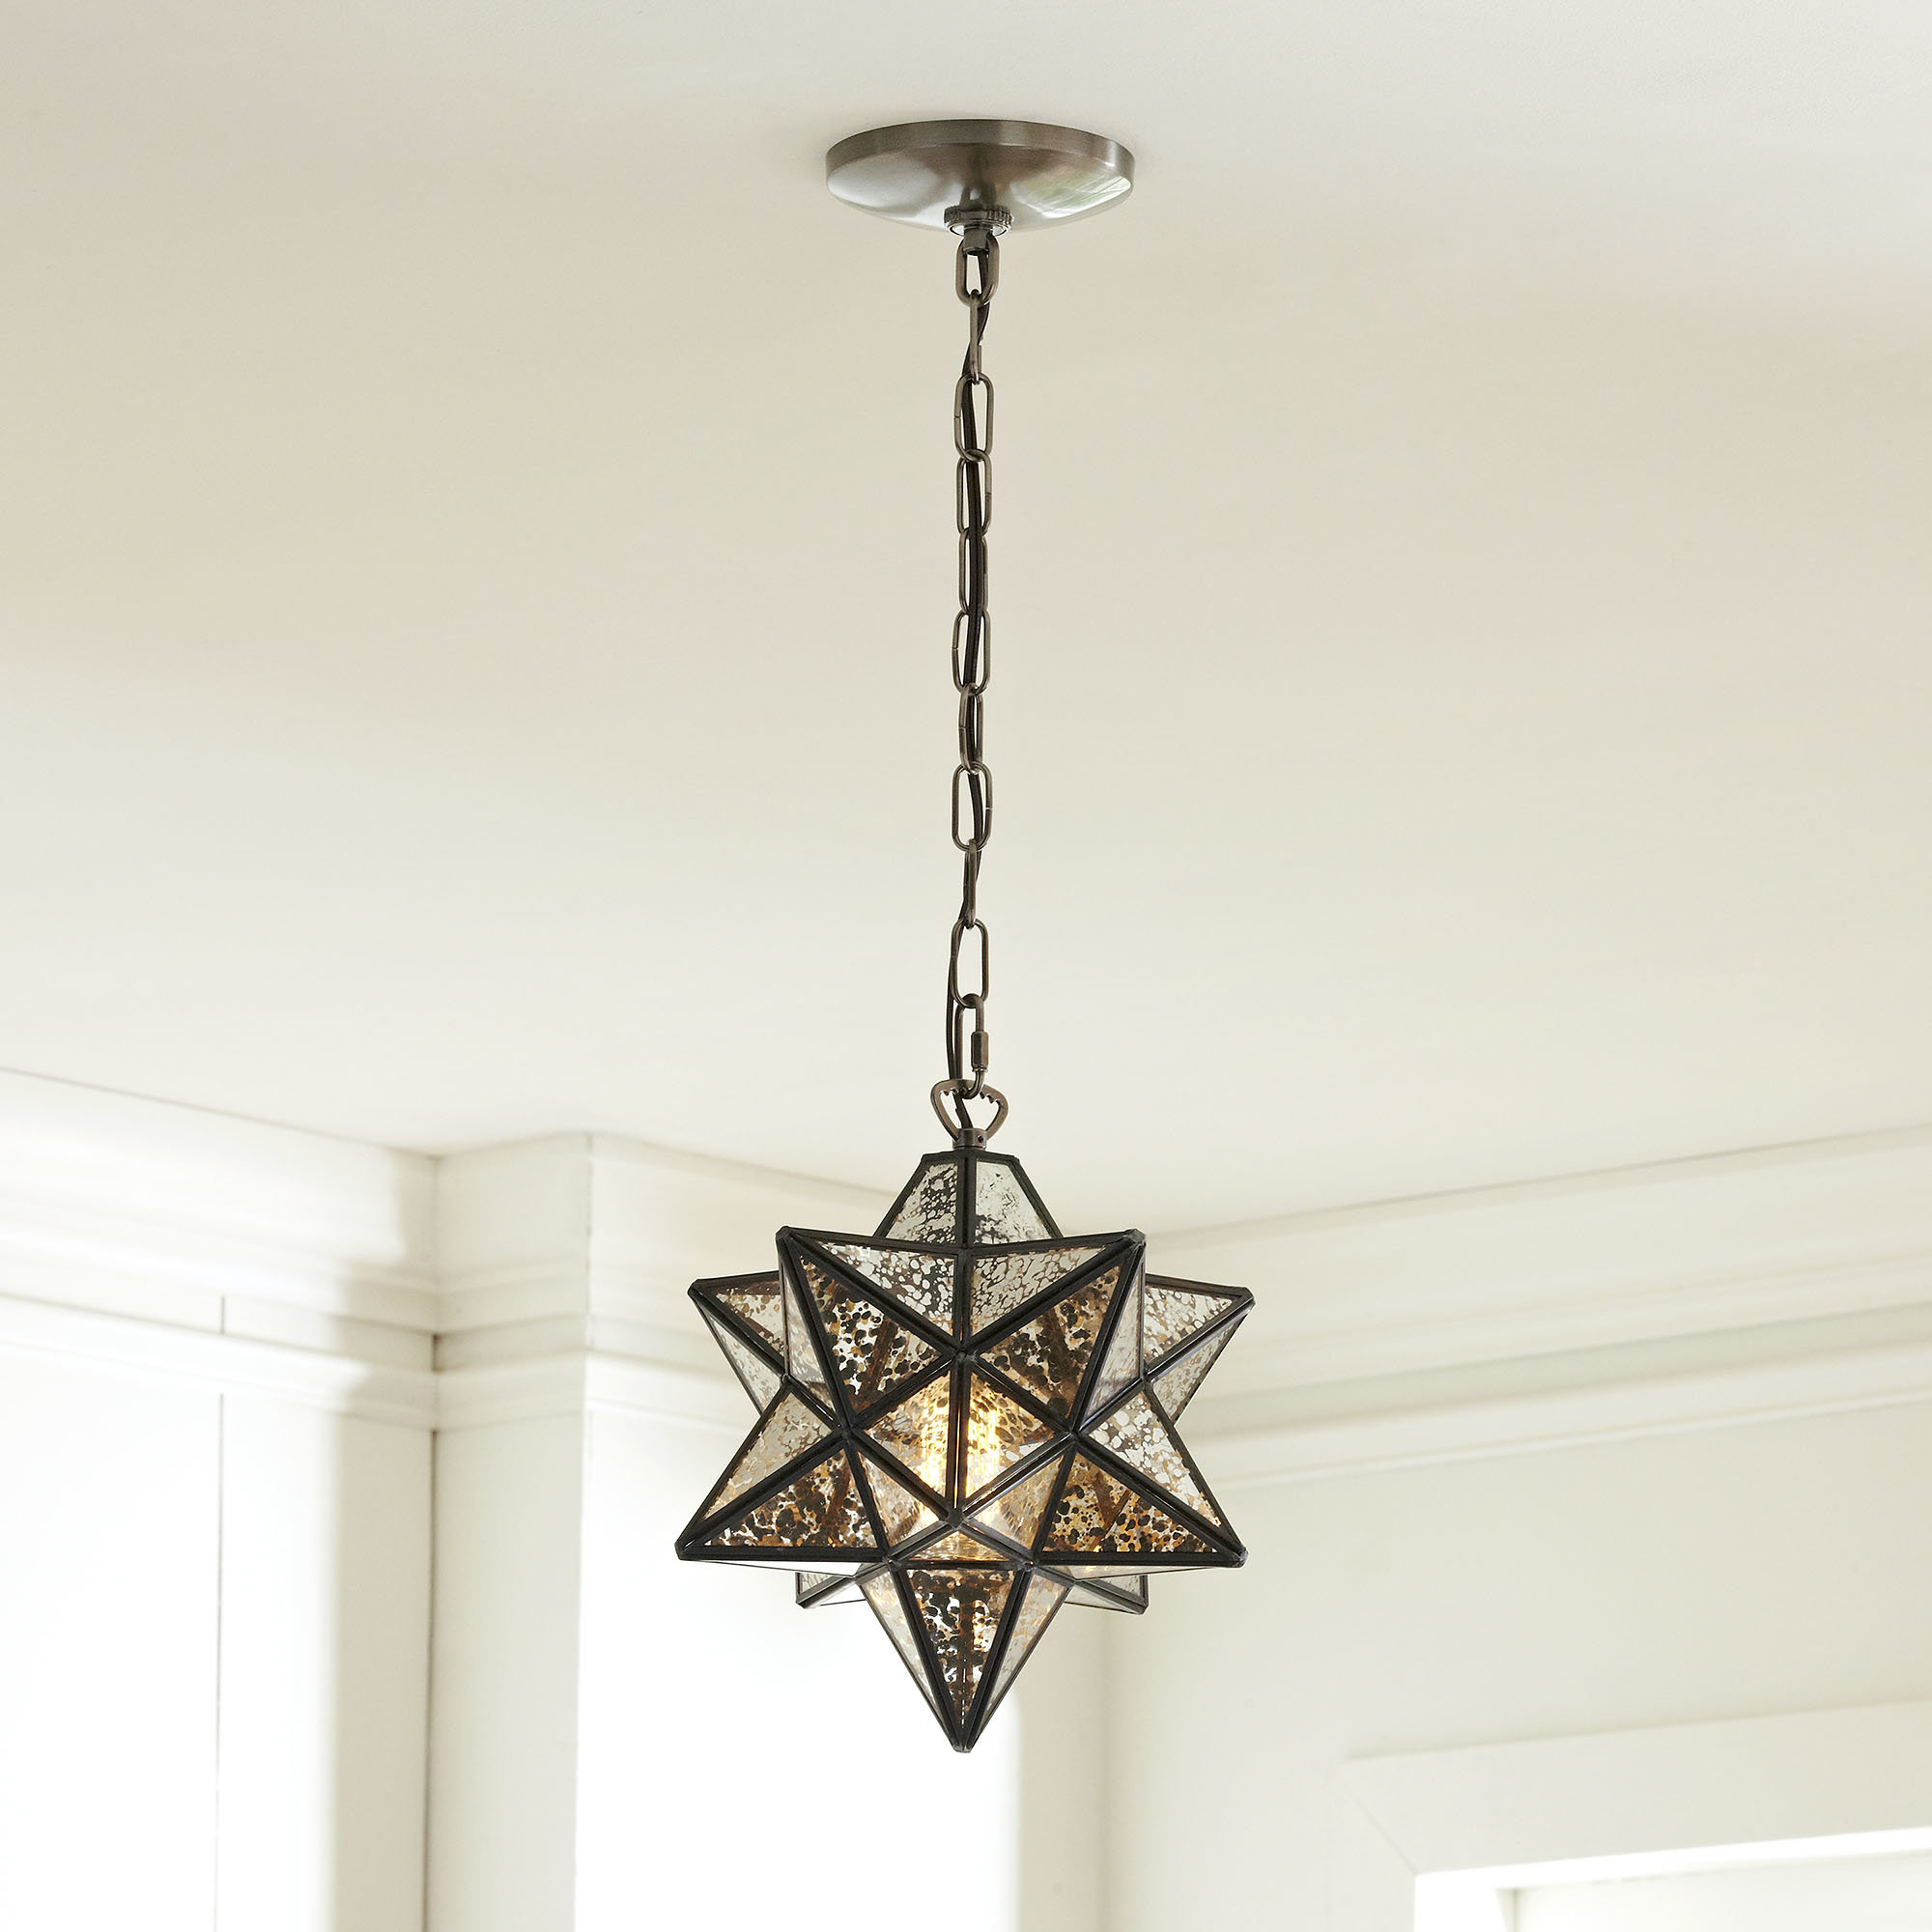 1 Light Single Star Pendant Throughout Popular 1 Light Single Star Pendants (Gallery 8 of 25)